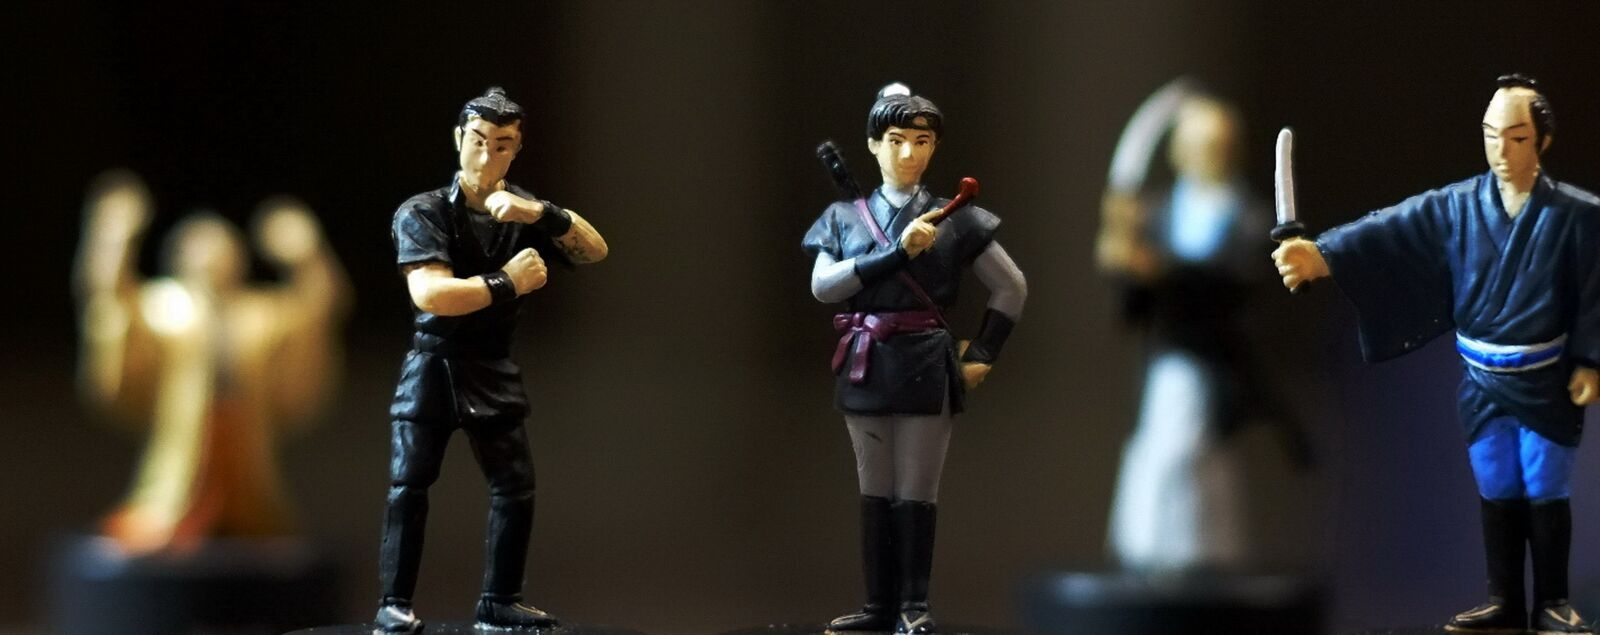 "Fujifilm X-E1 sample photo. ""Model, doll, character"" photography"